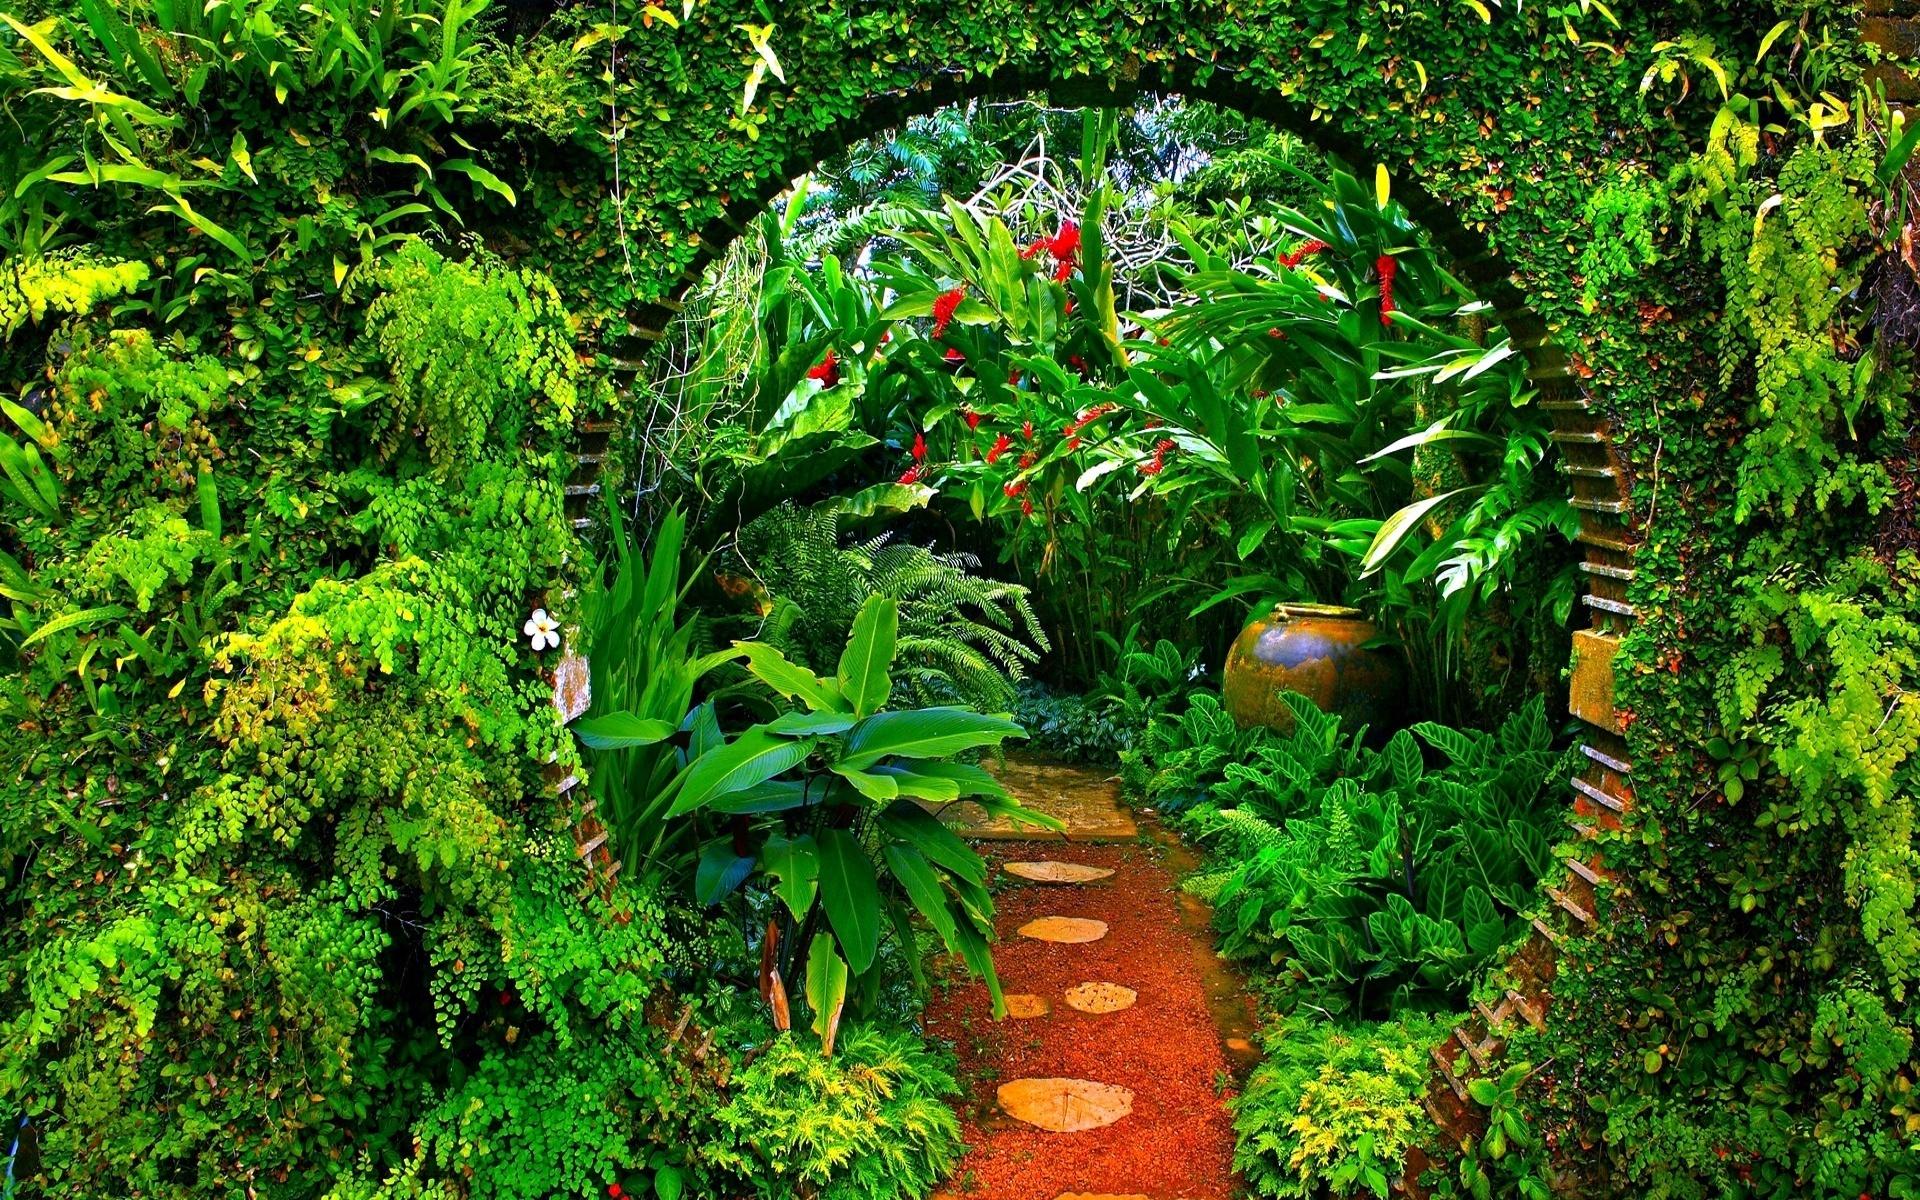 garden safari painel greenhouse festa wallpapers 2x1 plants 50x1 desktop backgrounds outdoor wide jungle aesthetic lona elo7 infantil event goa